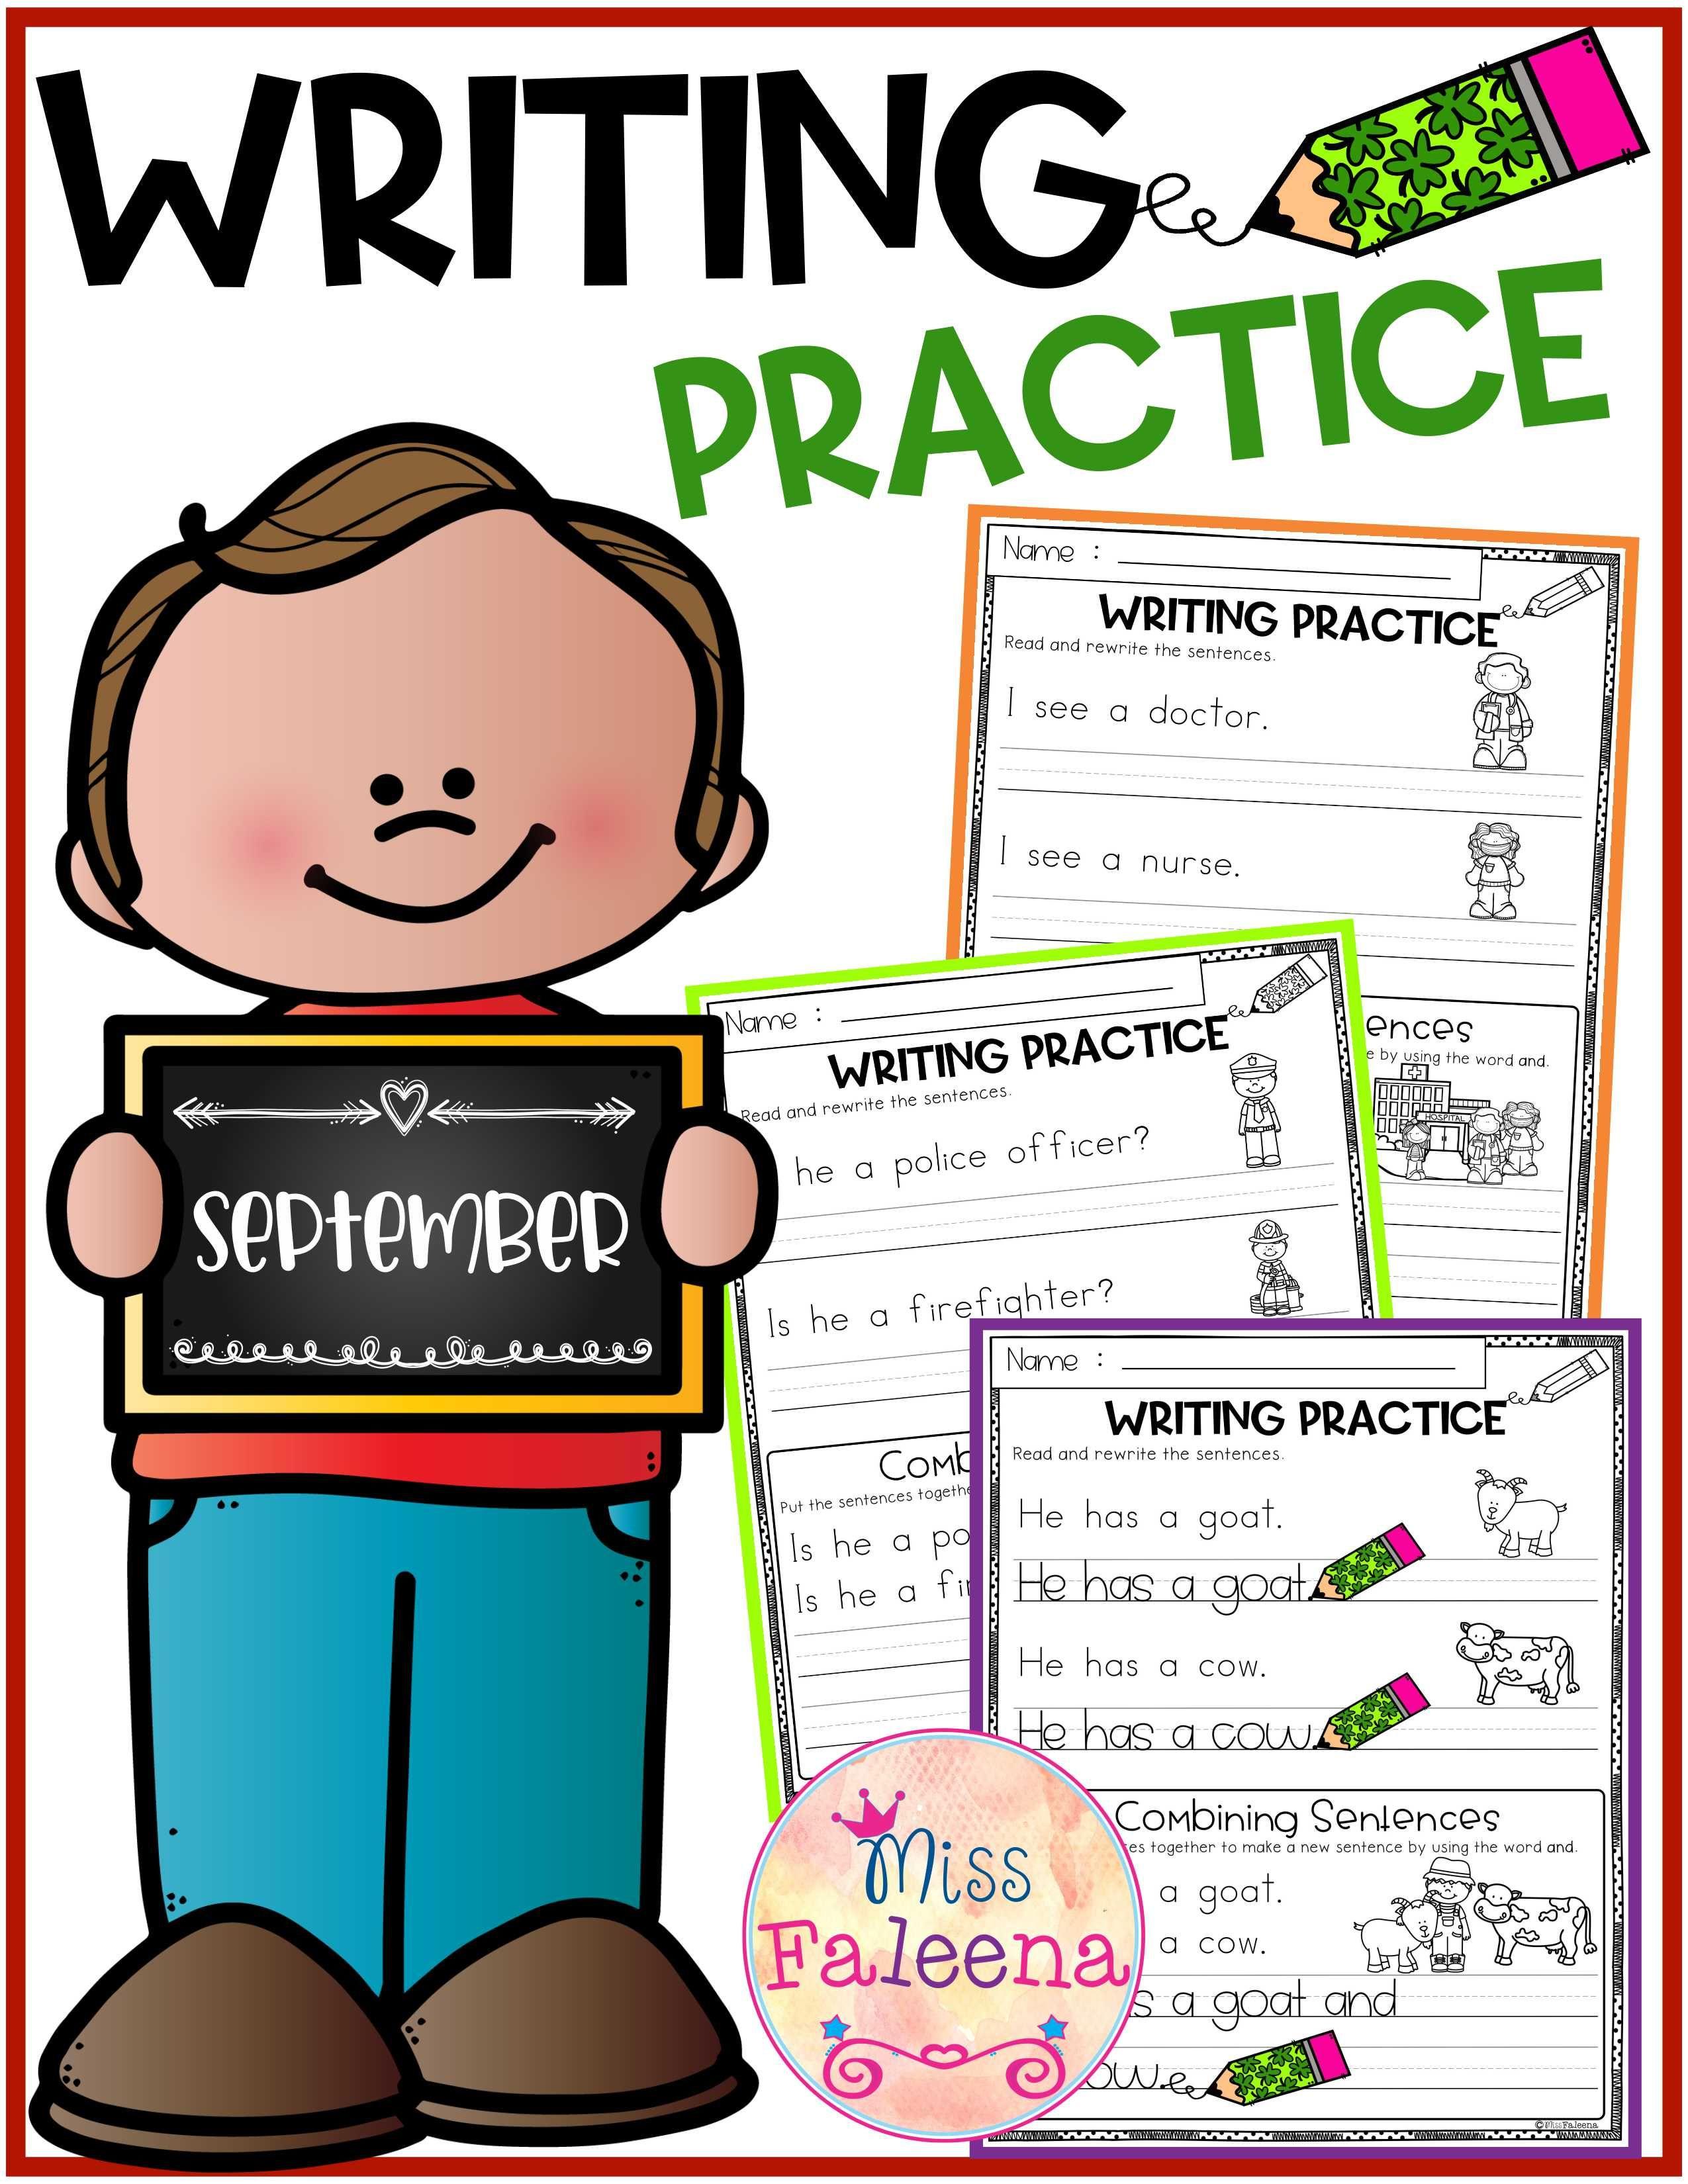 September Writing Practice Combining Sentences